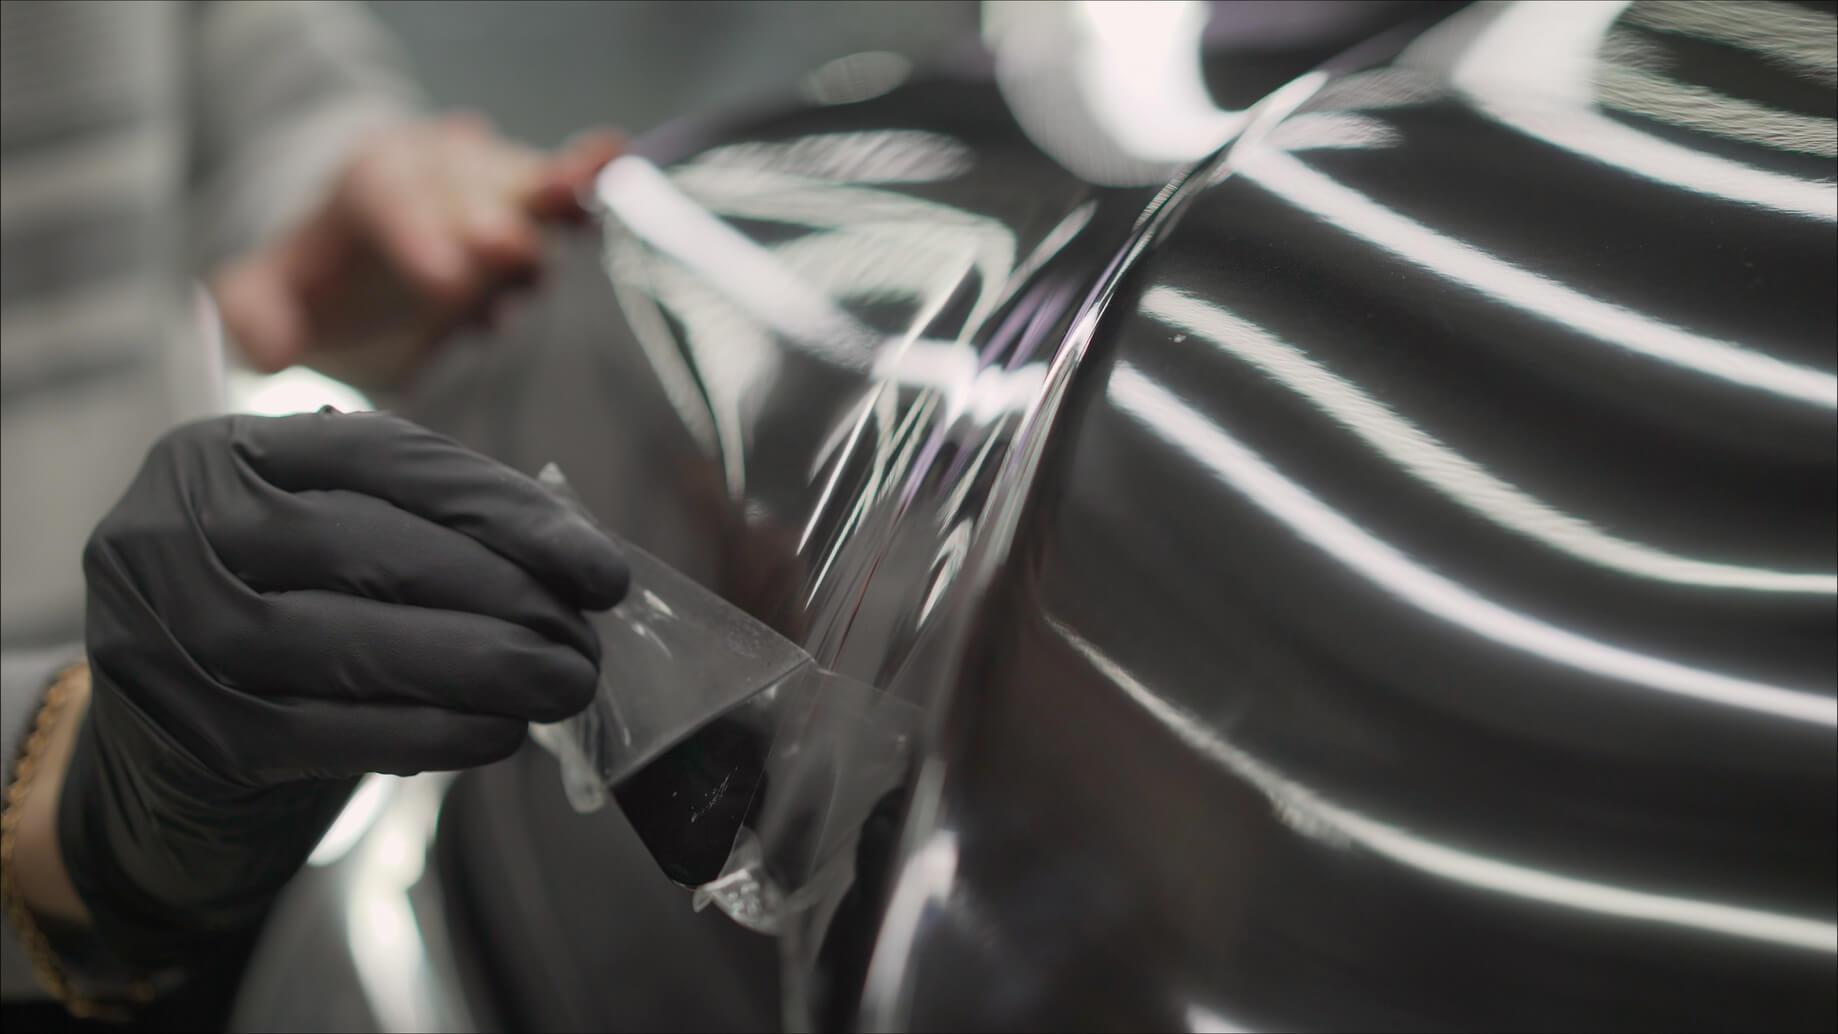 ochronna folia samoprzylepna do metalu samdex